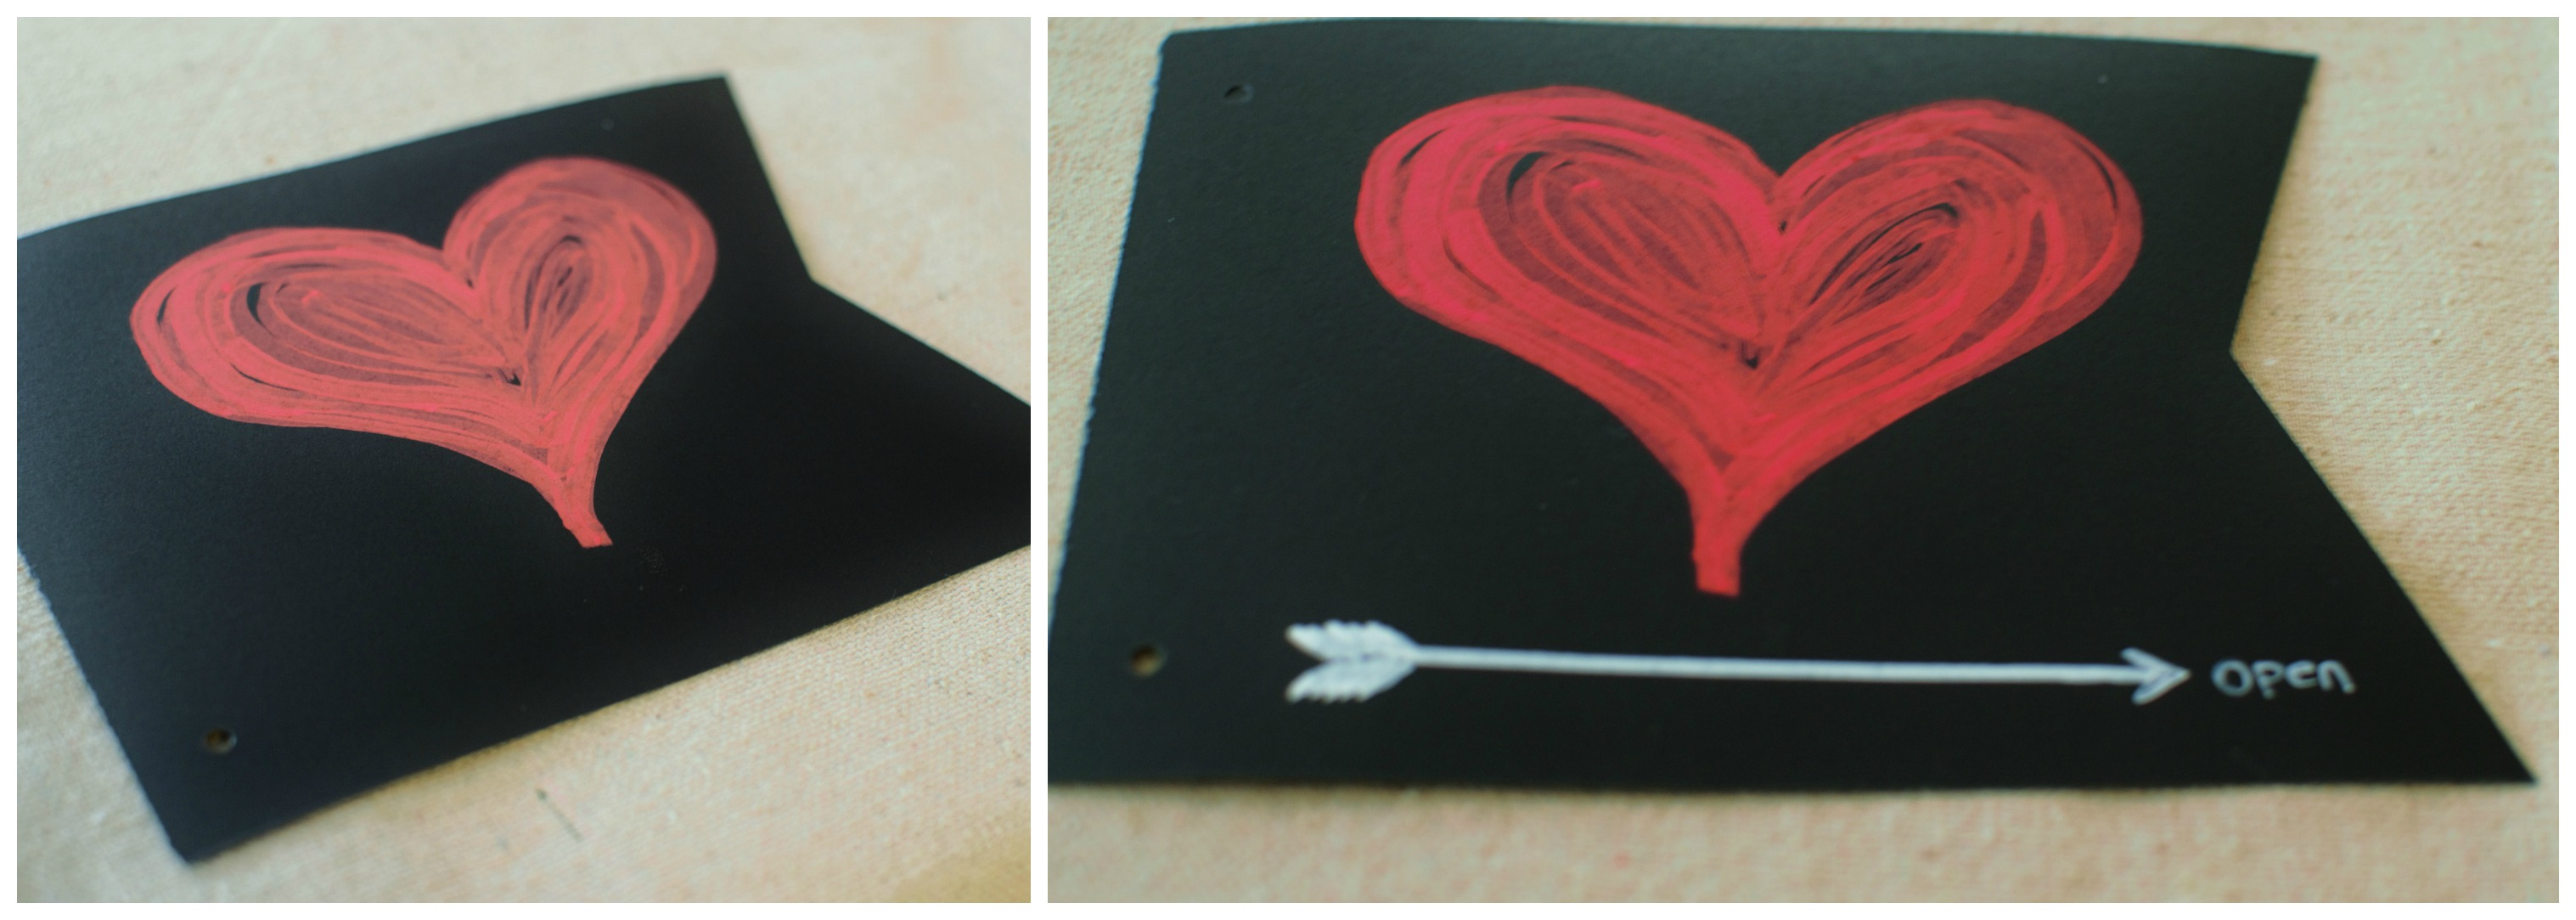 designing a chalkboard photo album